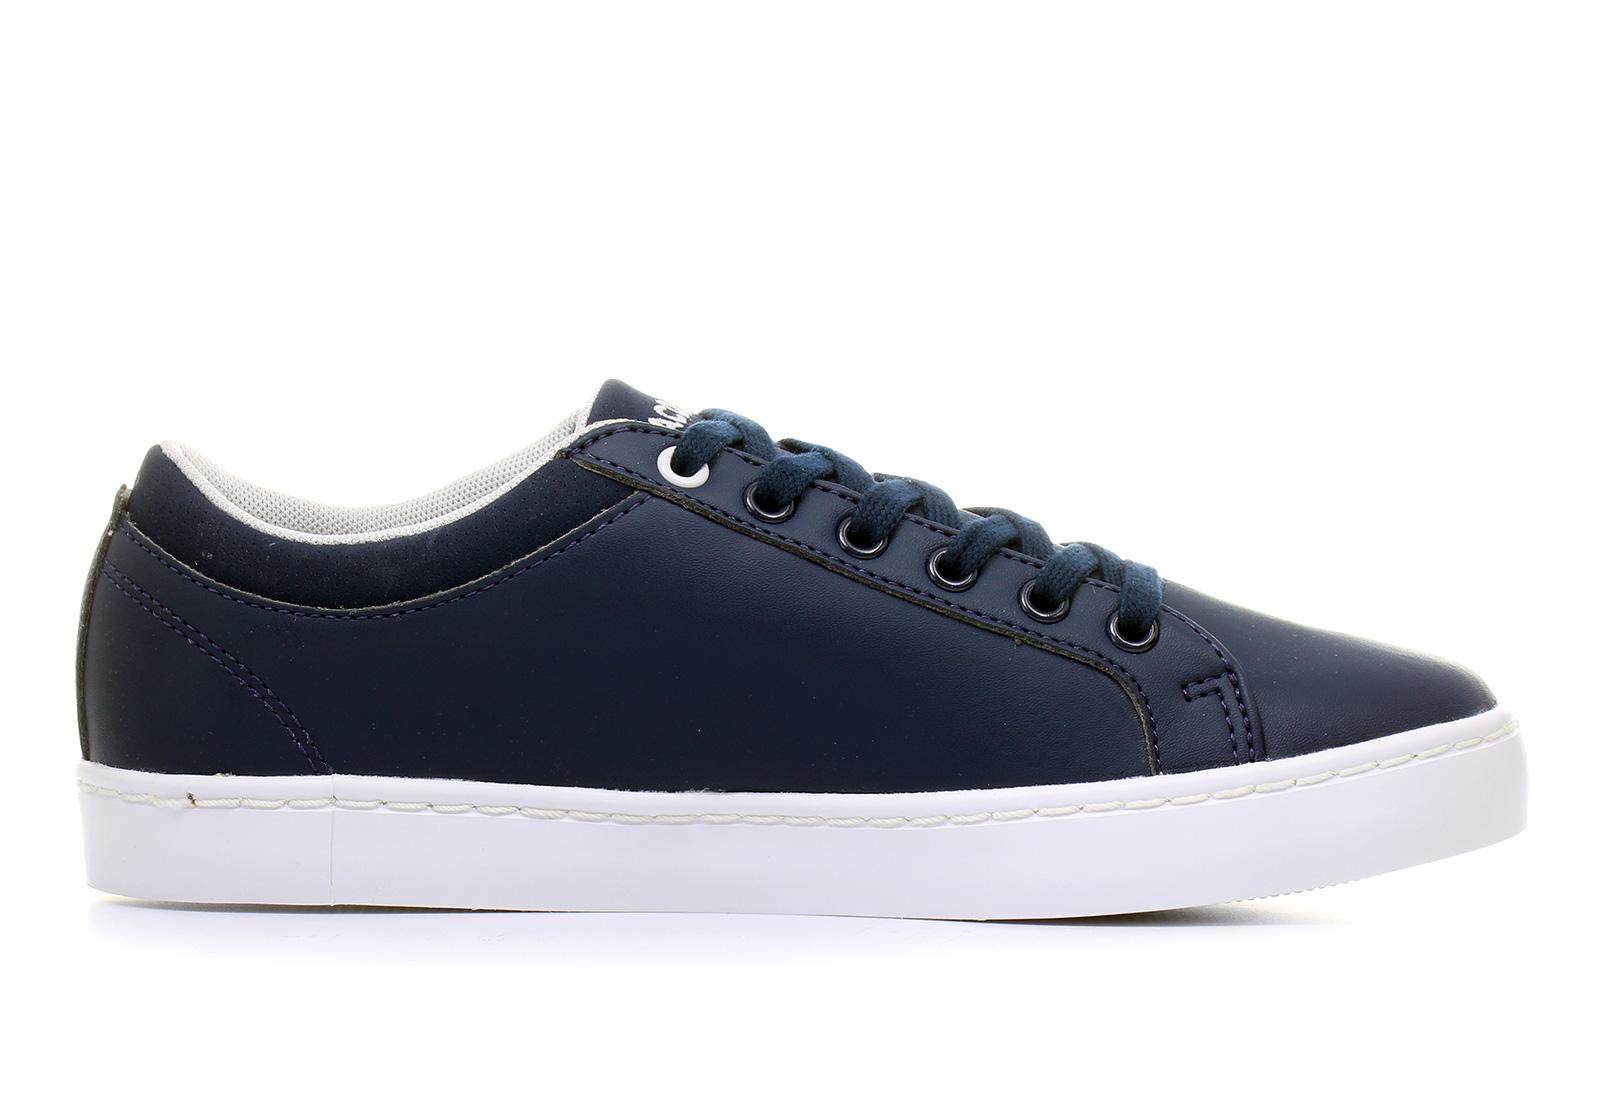 Lacoste Cipő - Straightset Lace 1 - 163spj0103-003 - Office Shoes ... 09d48aa91b